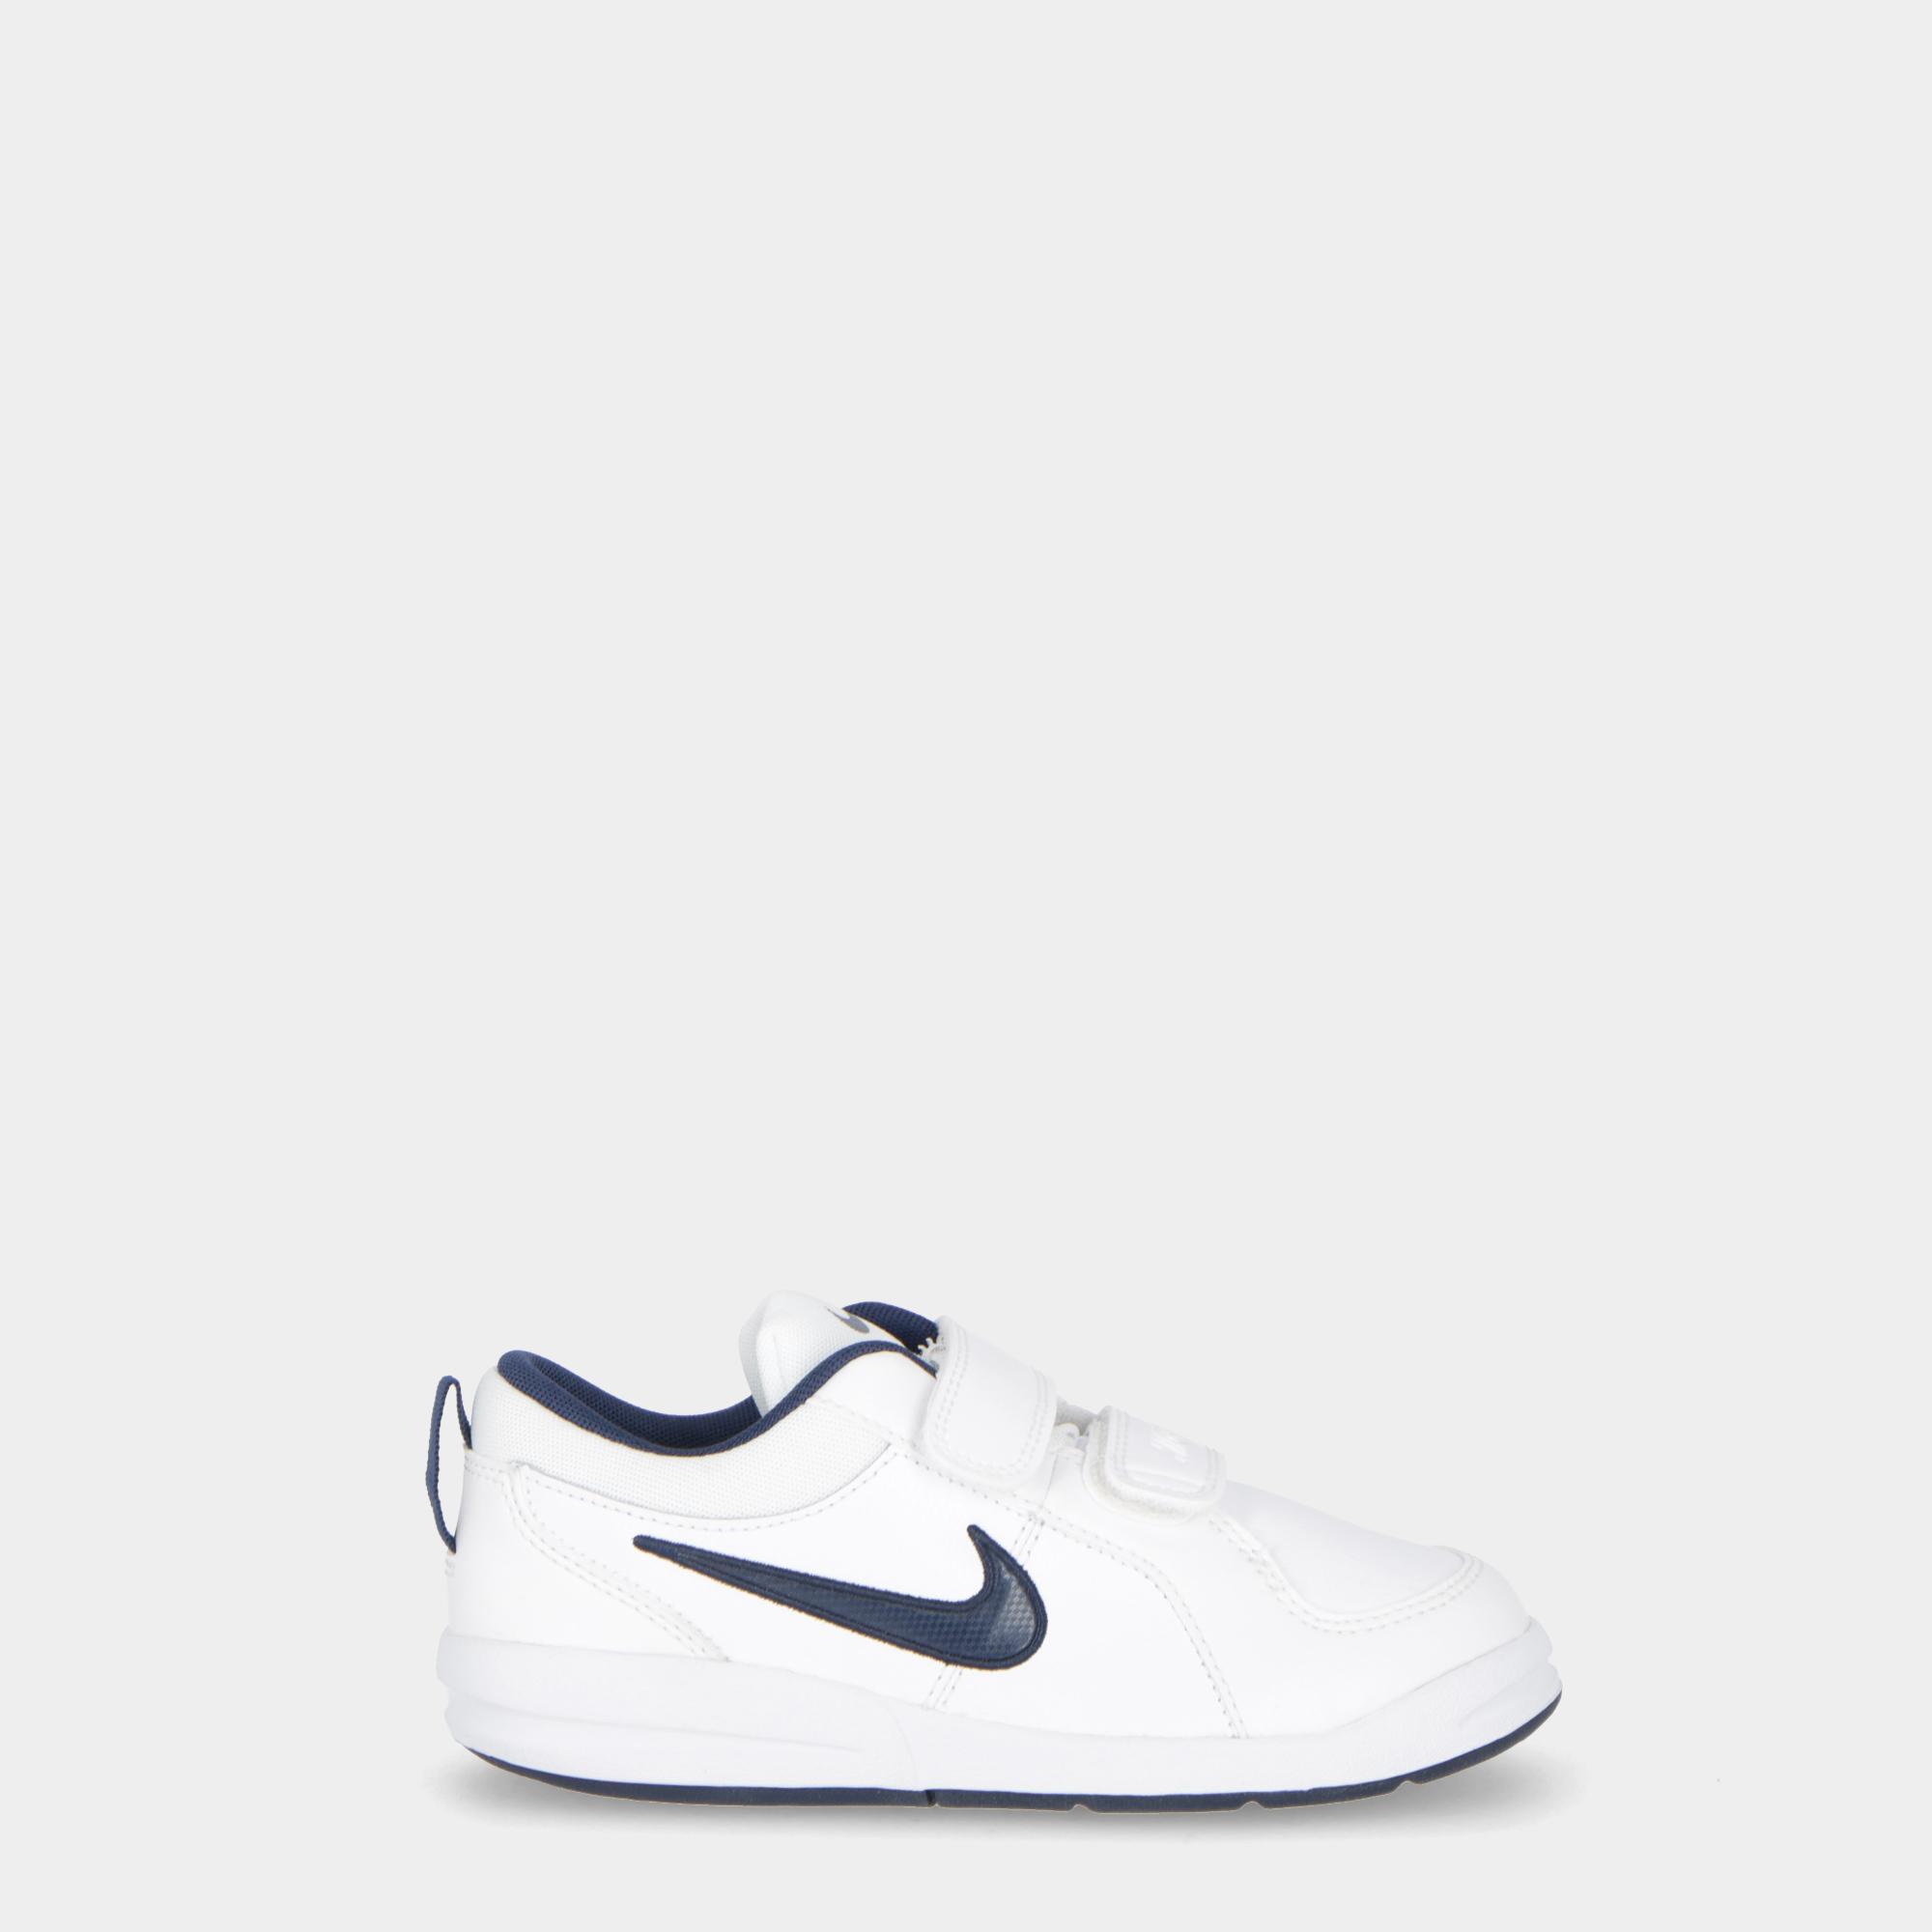 new arrive 831e5 b6bb2 Nike Pico 4 (psv) - Kids WHITE NAVY